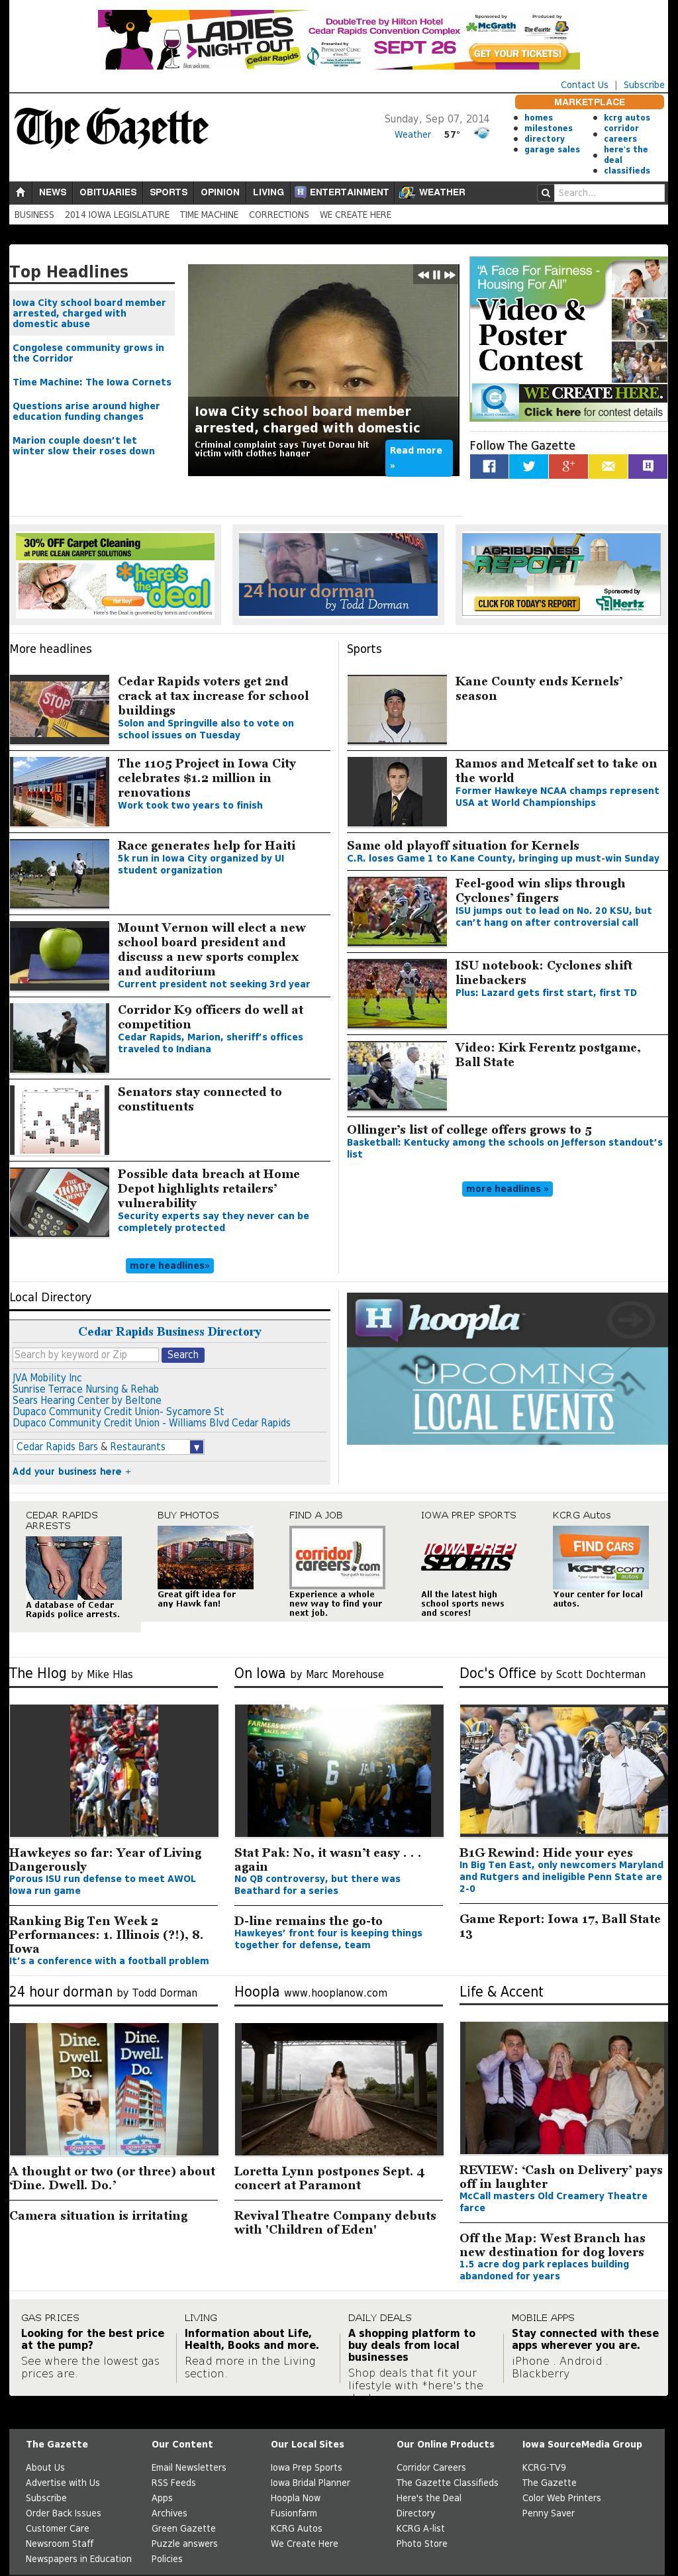 The (Cedar Rapids) Gazette at Monday Sept. 8, 2014, 5:06 a.m. UTC